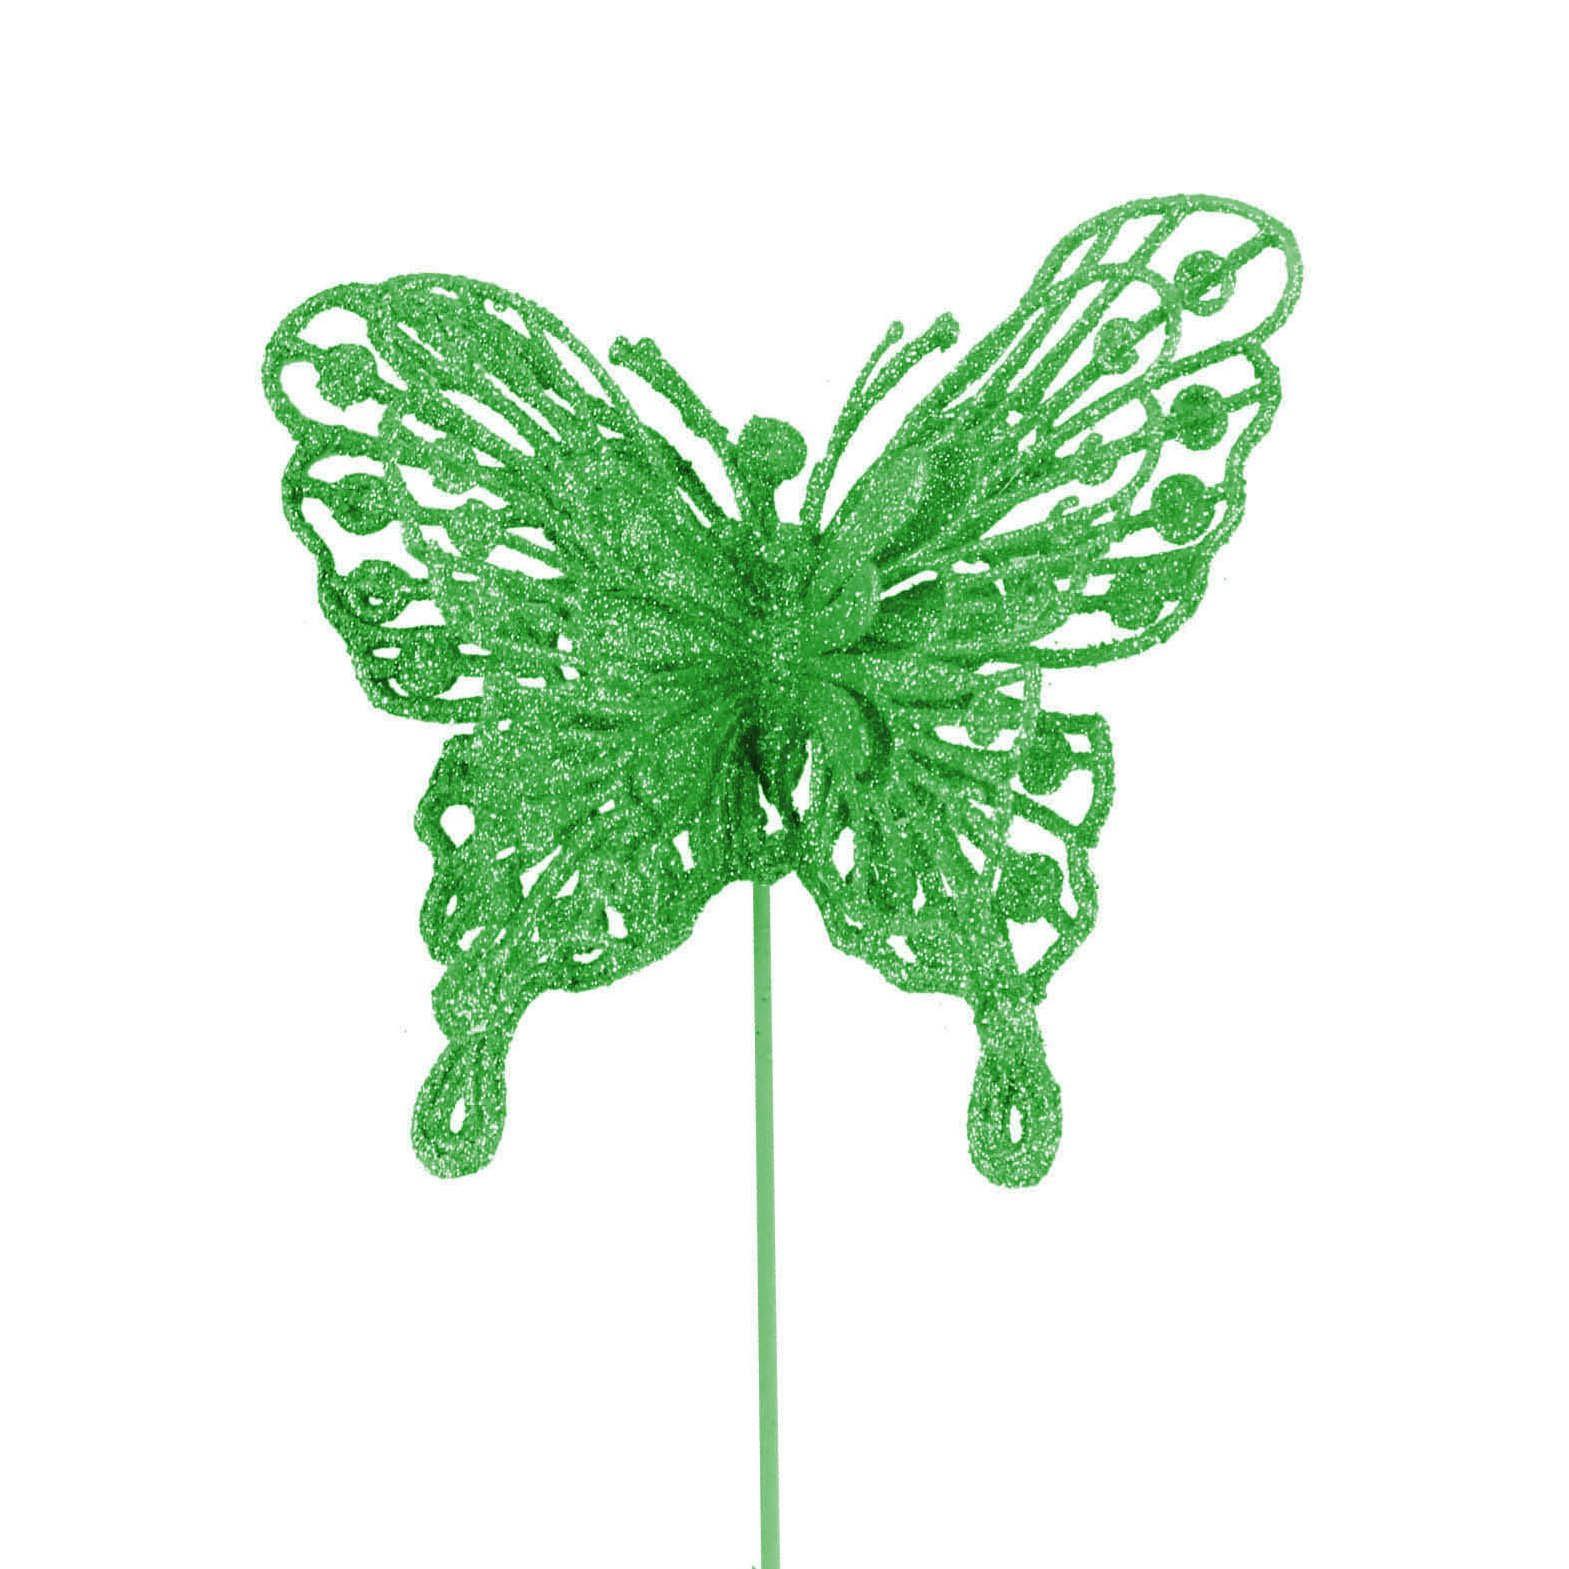 Heavy Glittered Large Double Layer Florist Butterflies Picks Artificial Glittery